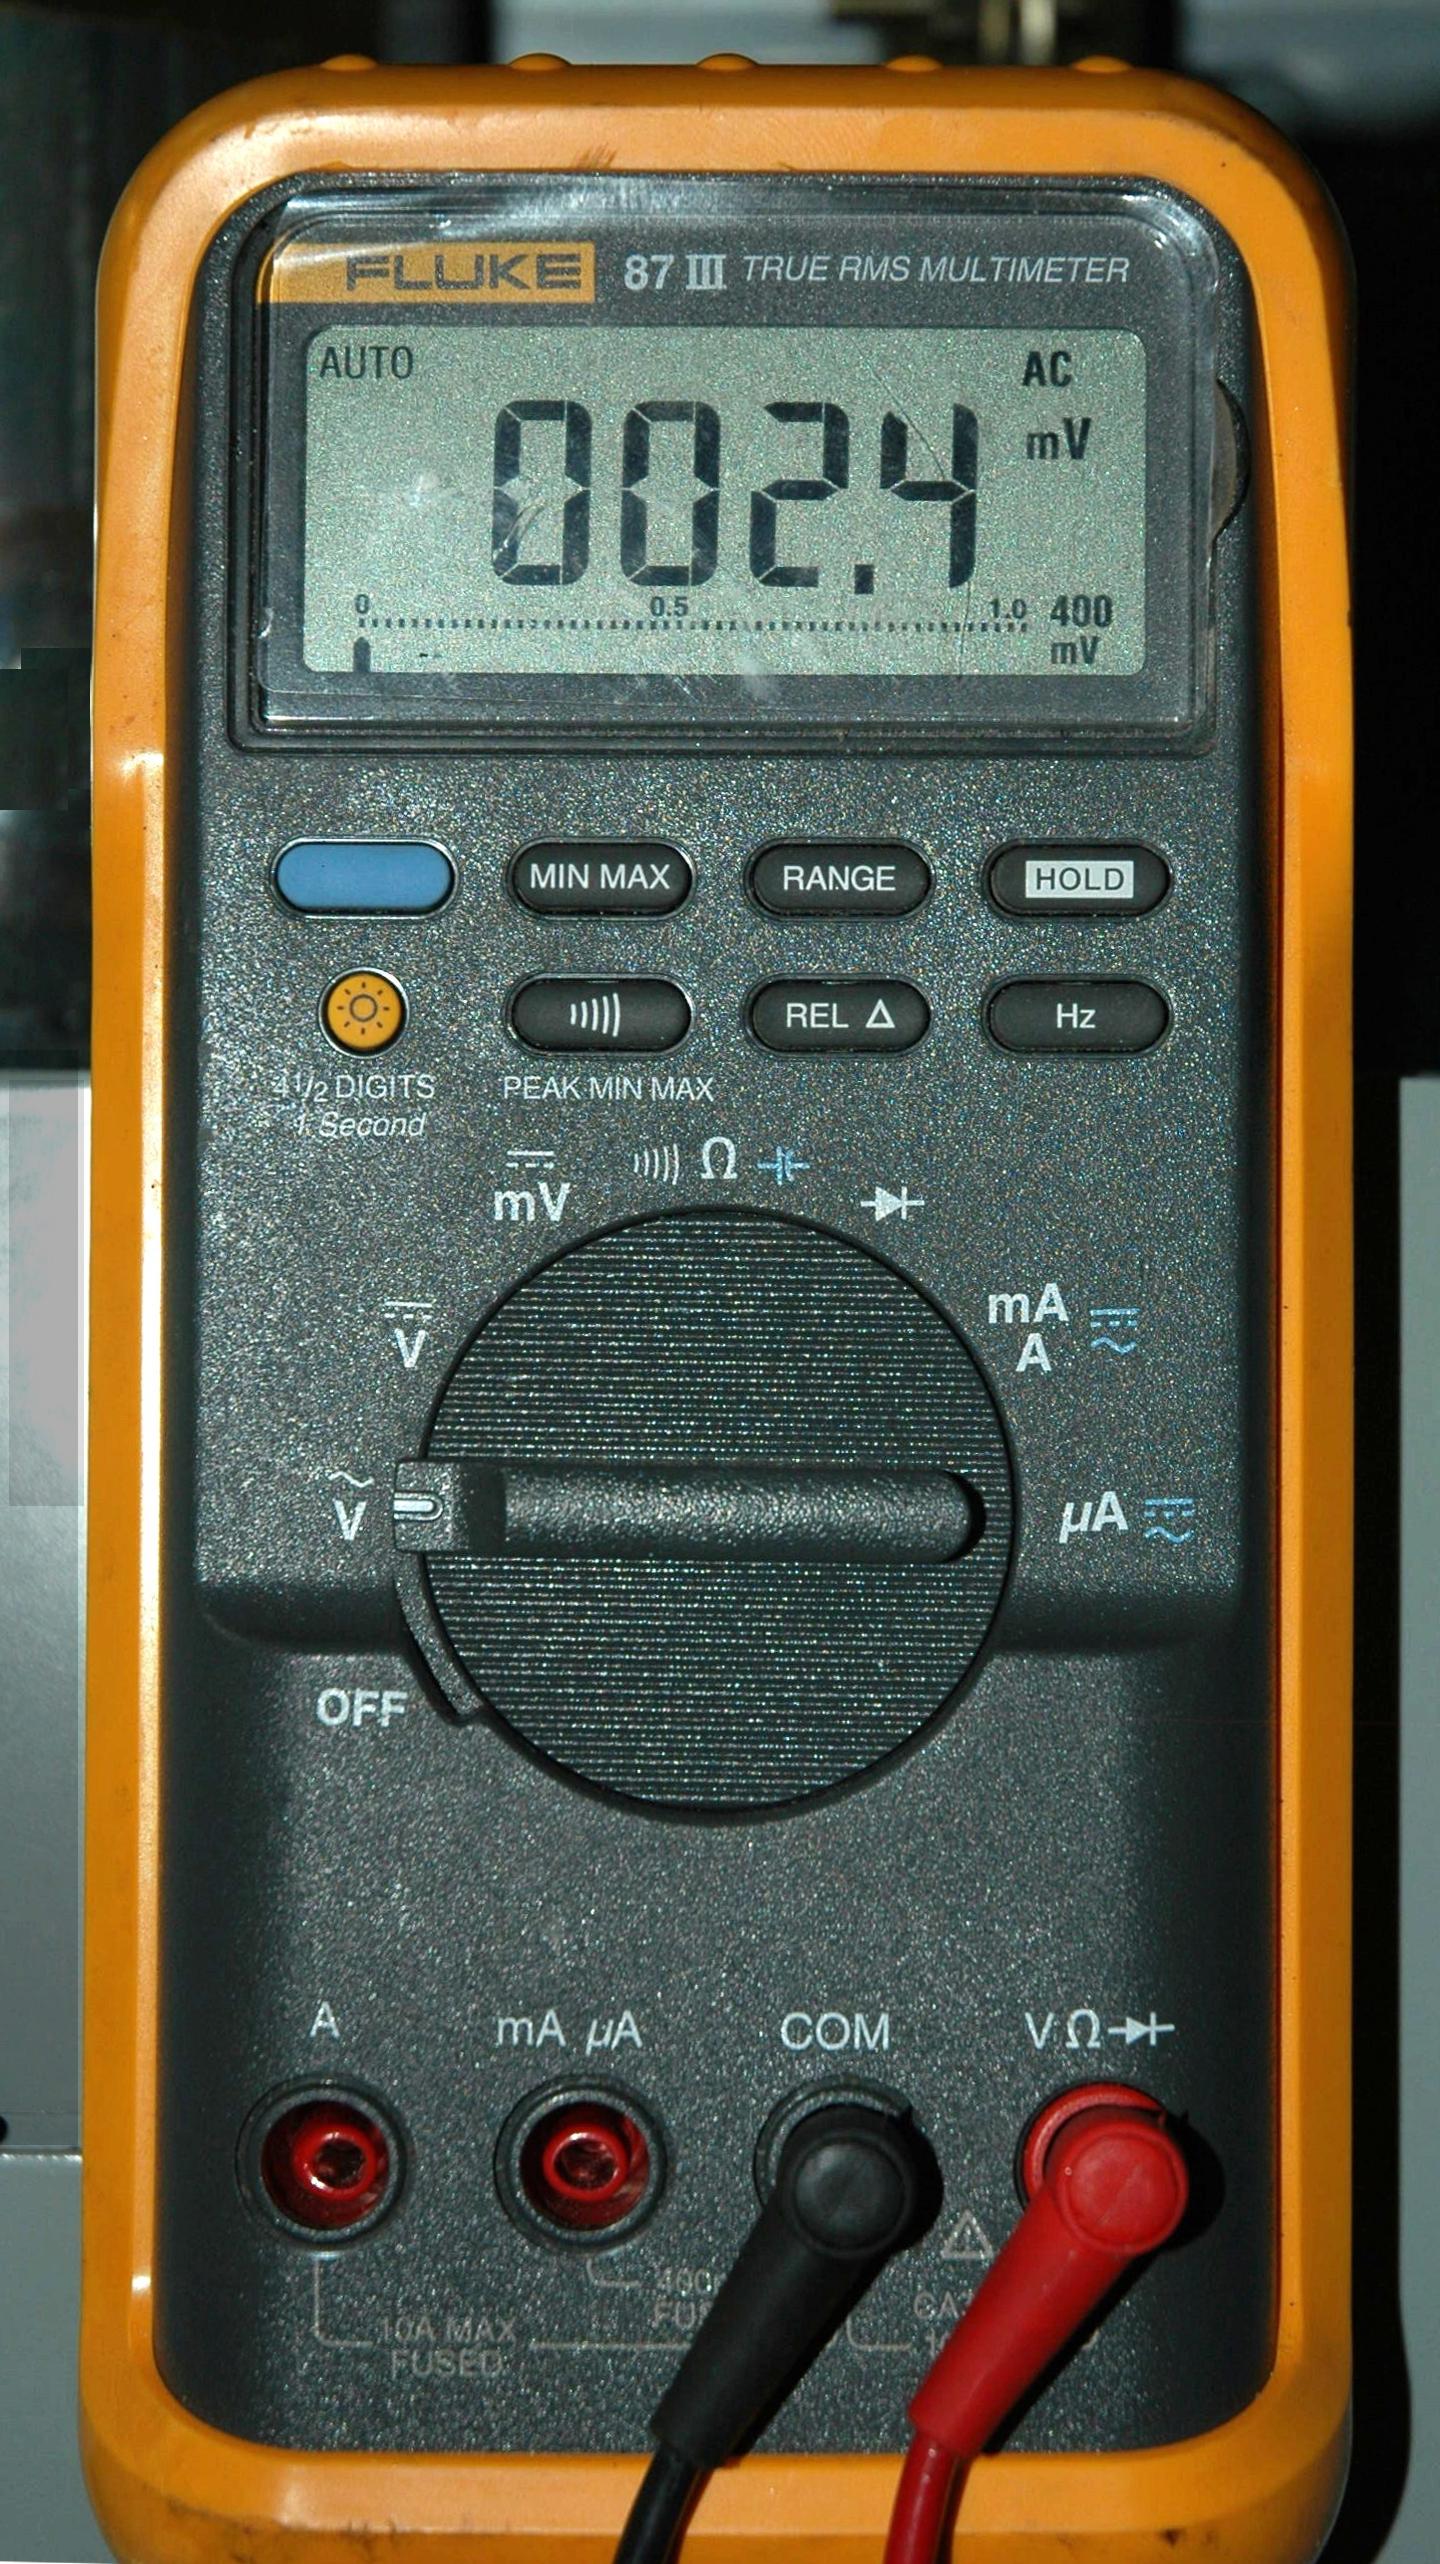 File:Fluke 87 III True RMS Multimeter-2.jpg